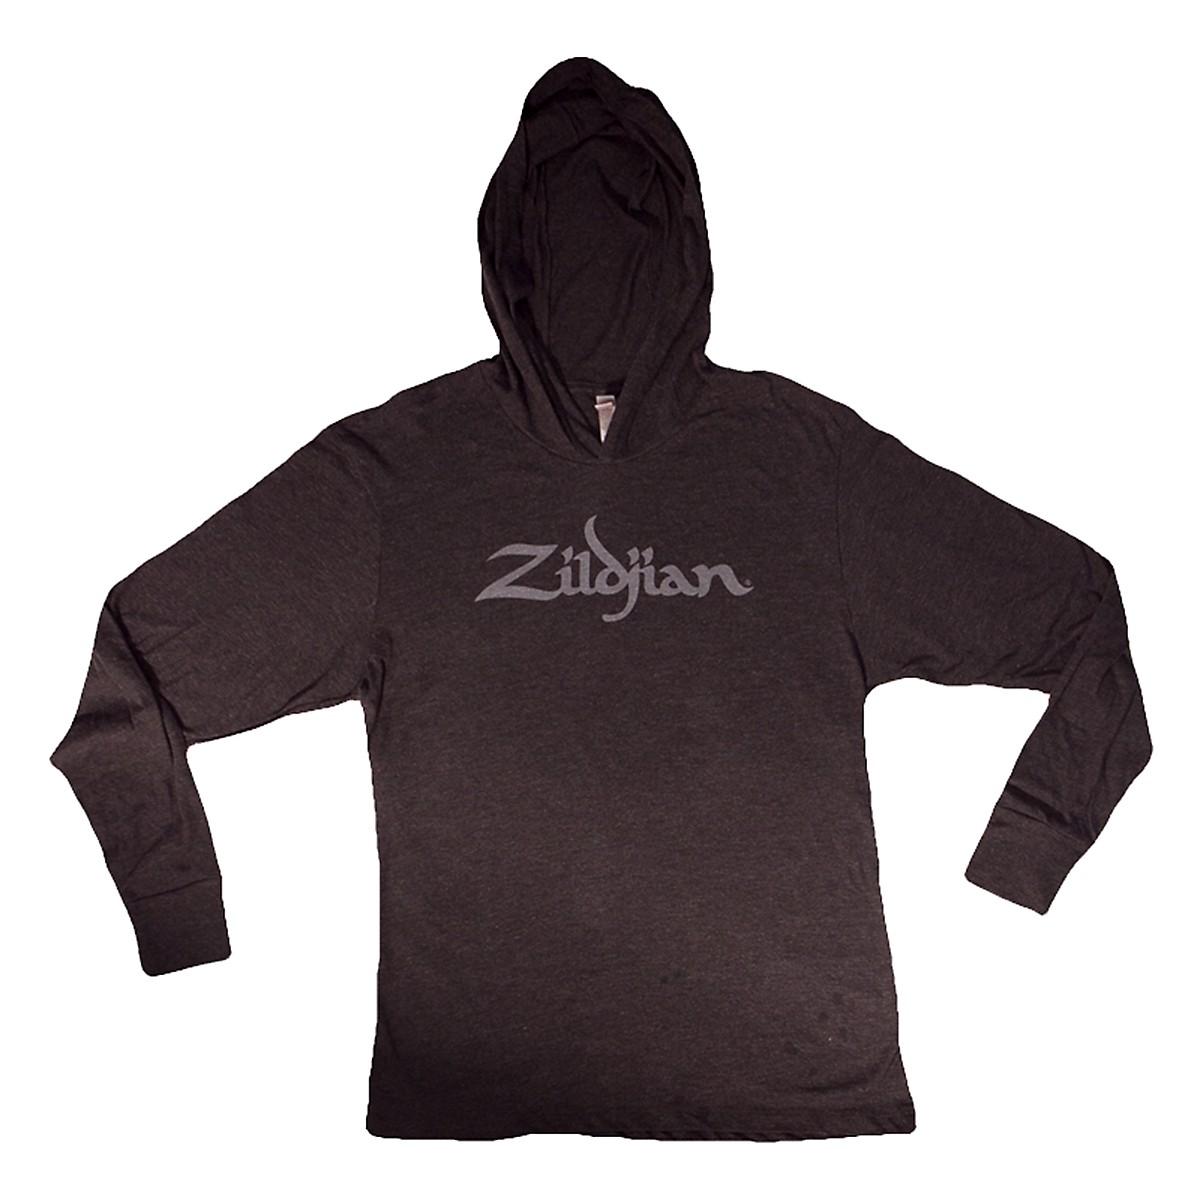 Zildjian Long Sleeve Hooded Shirt, Black